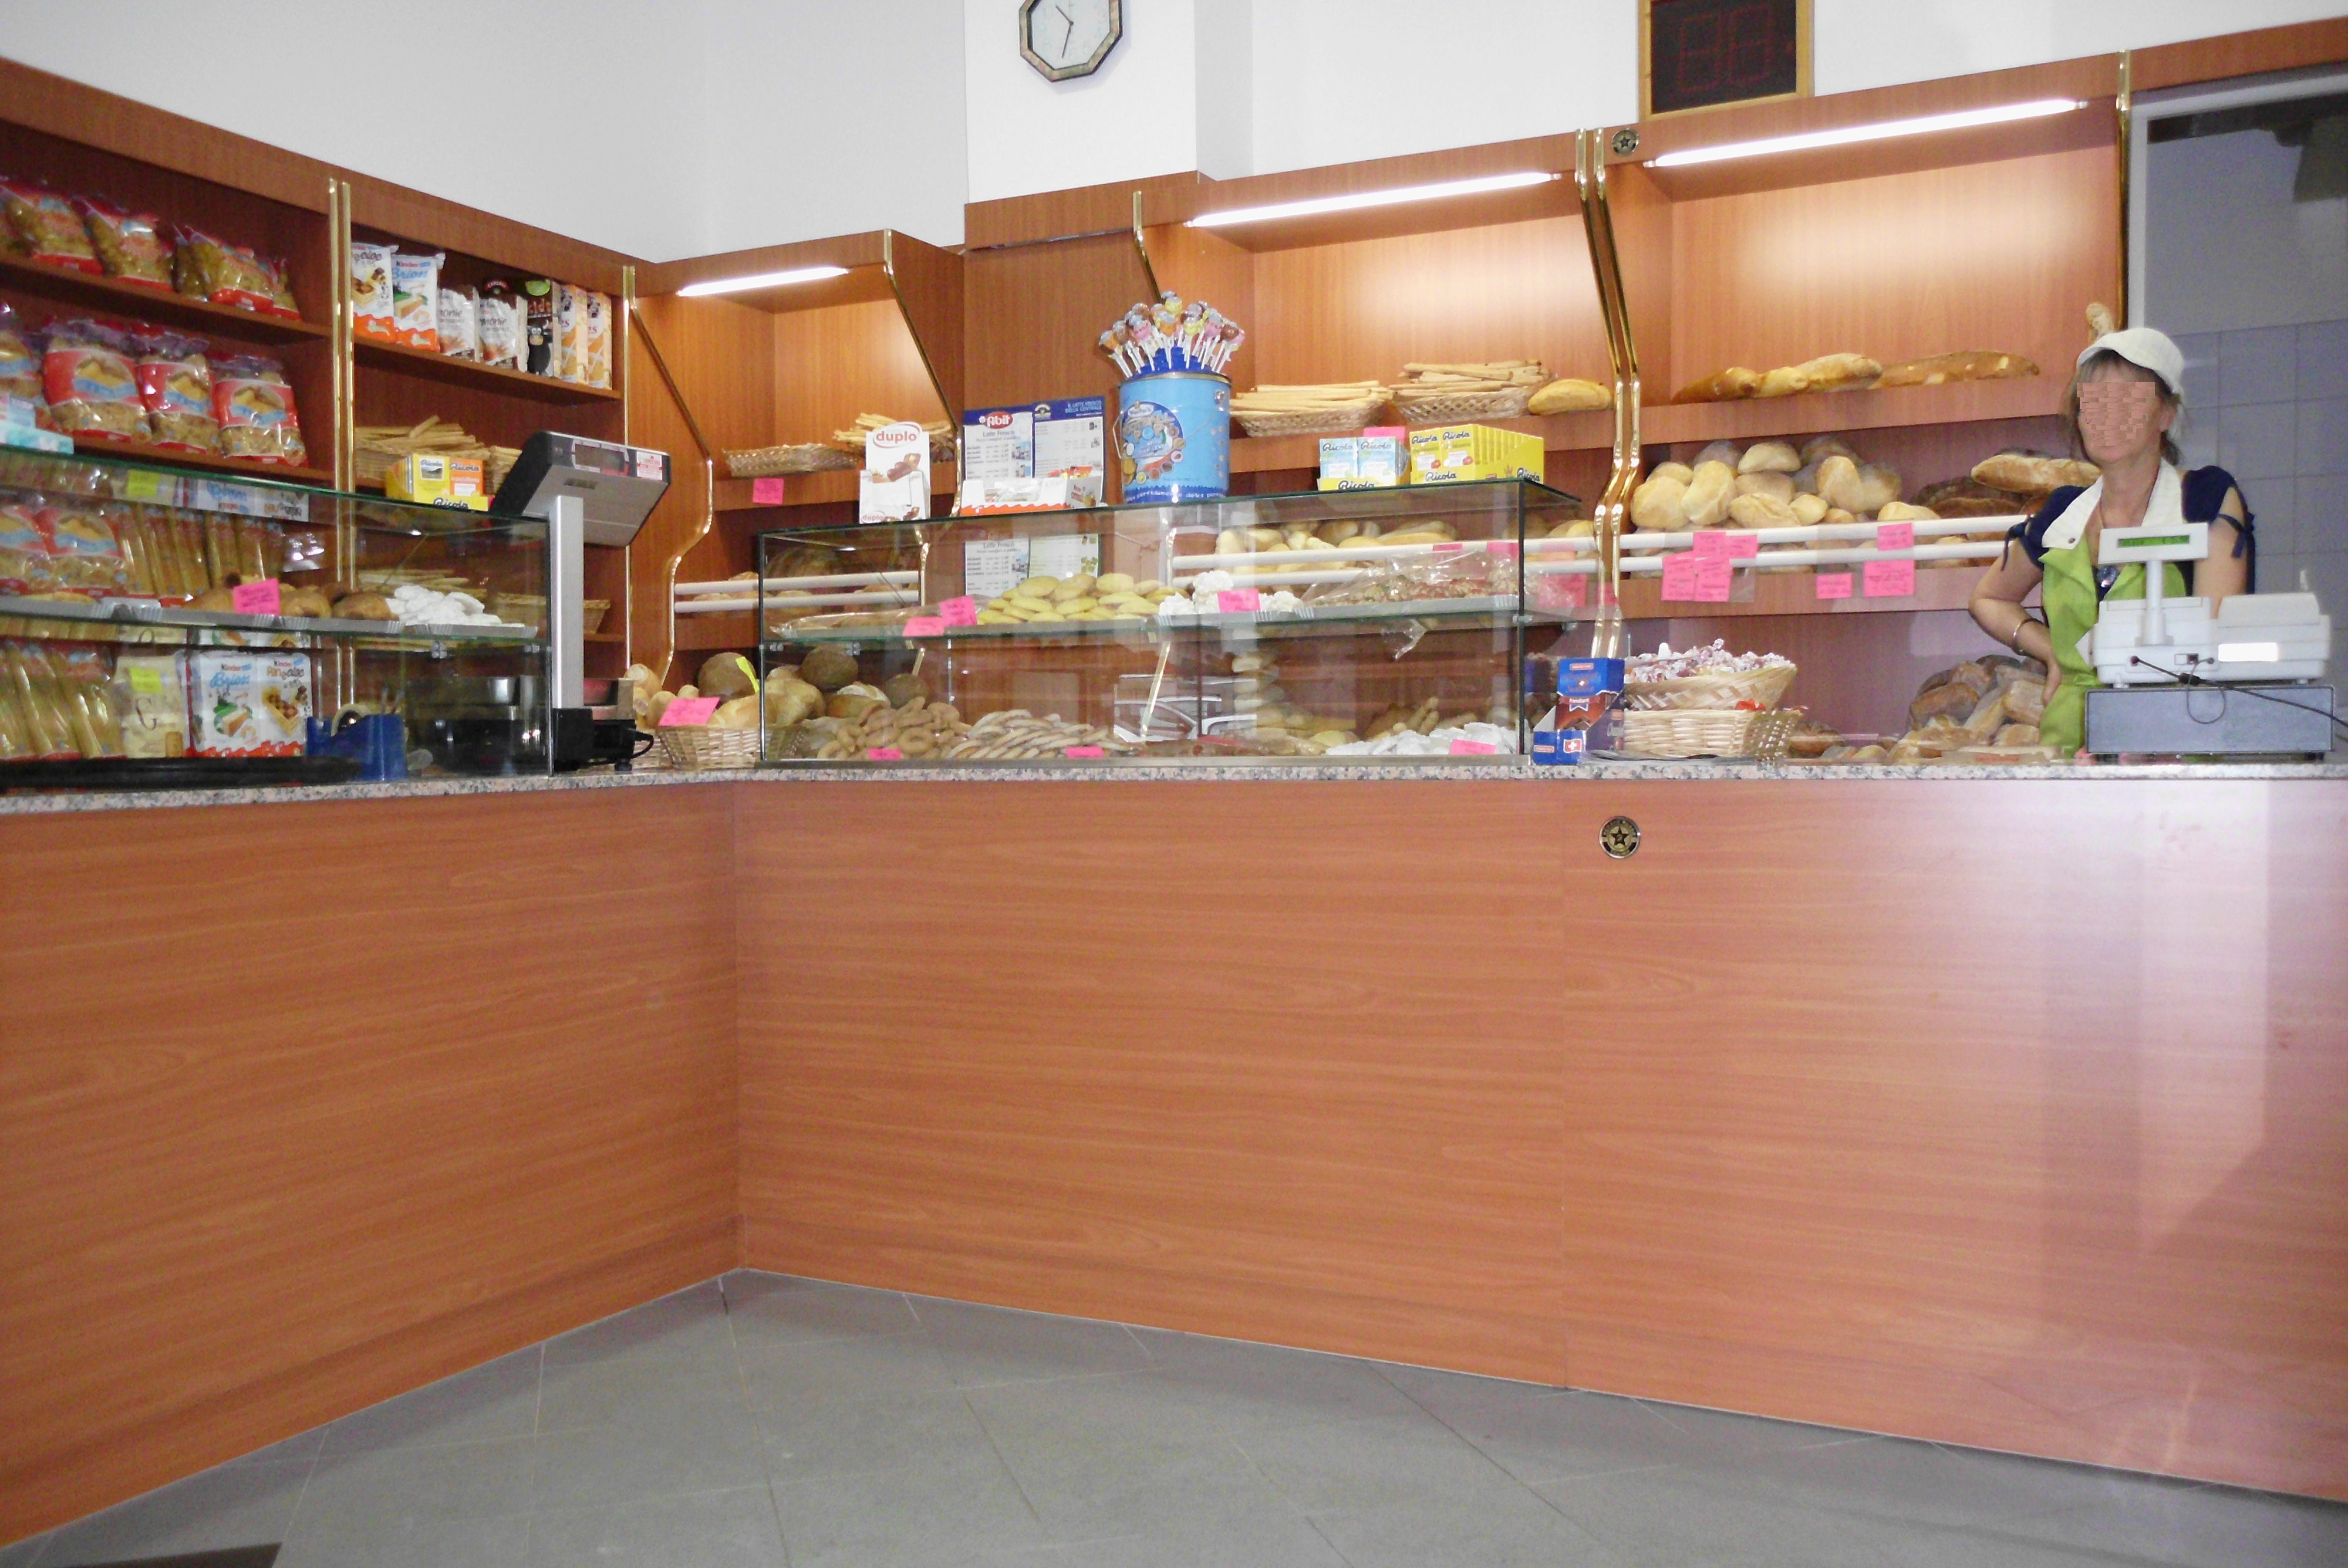 Arredamenti per panetterie compra in fabbrica vedi for Arredamento panetteria